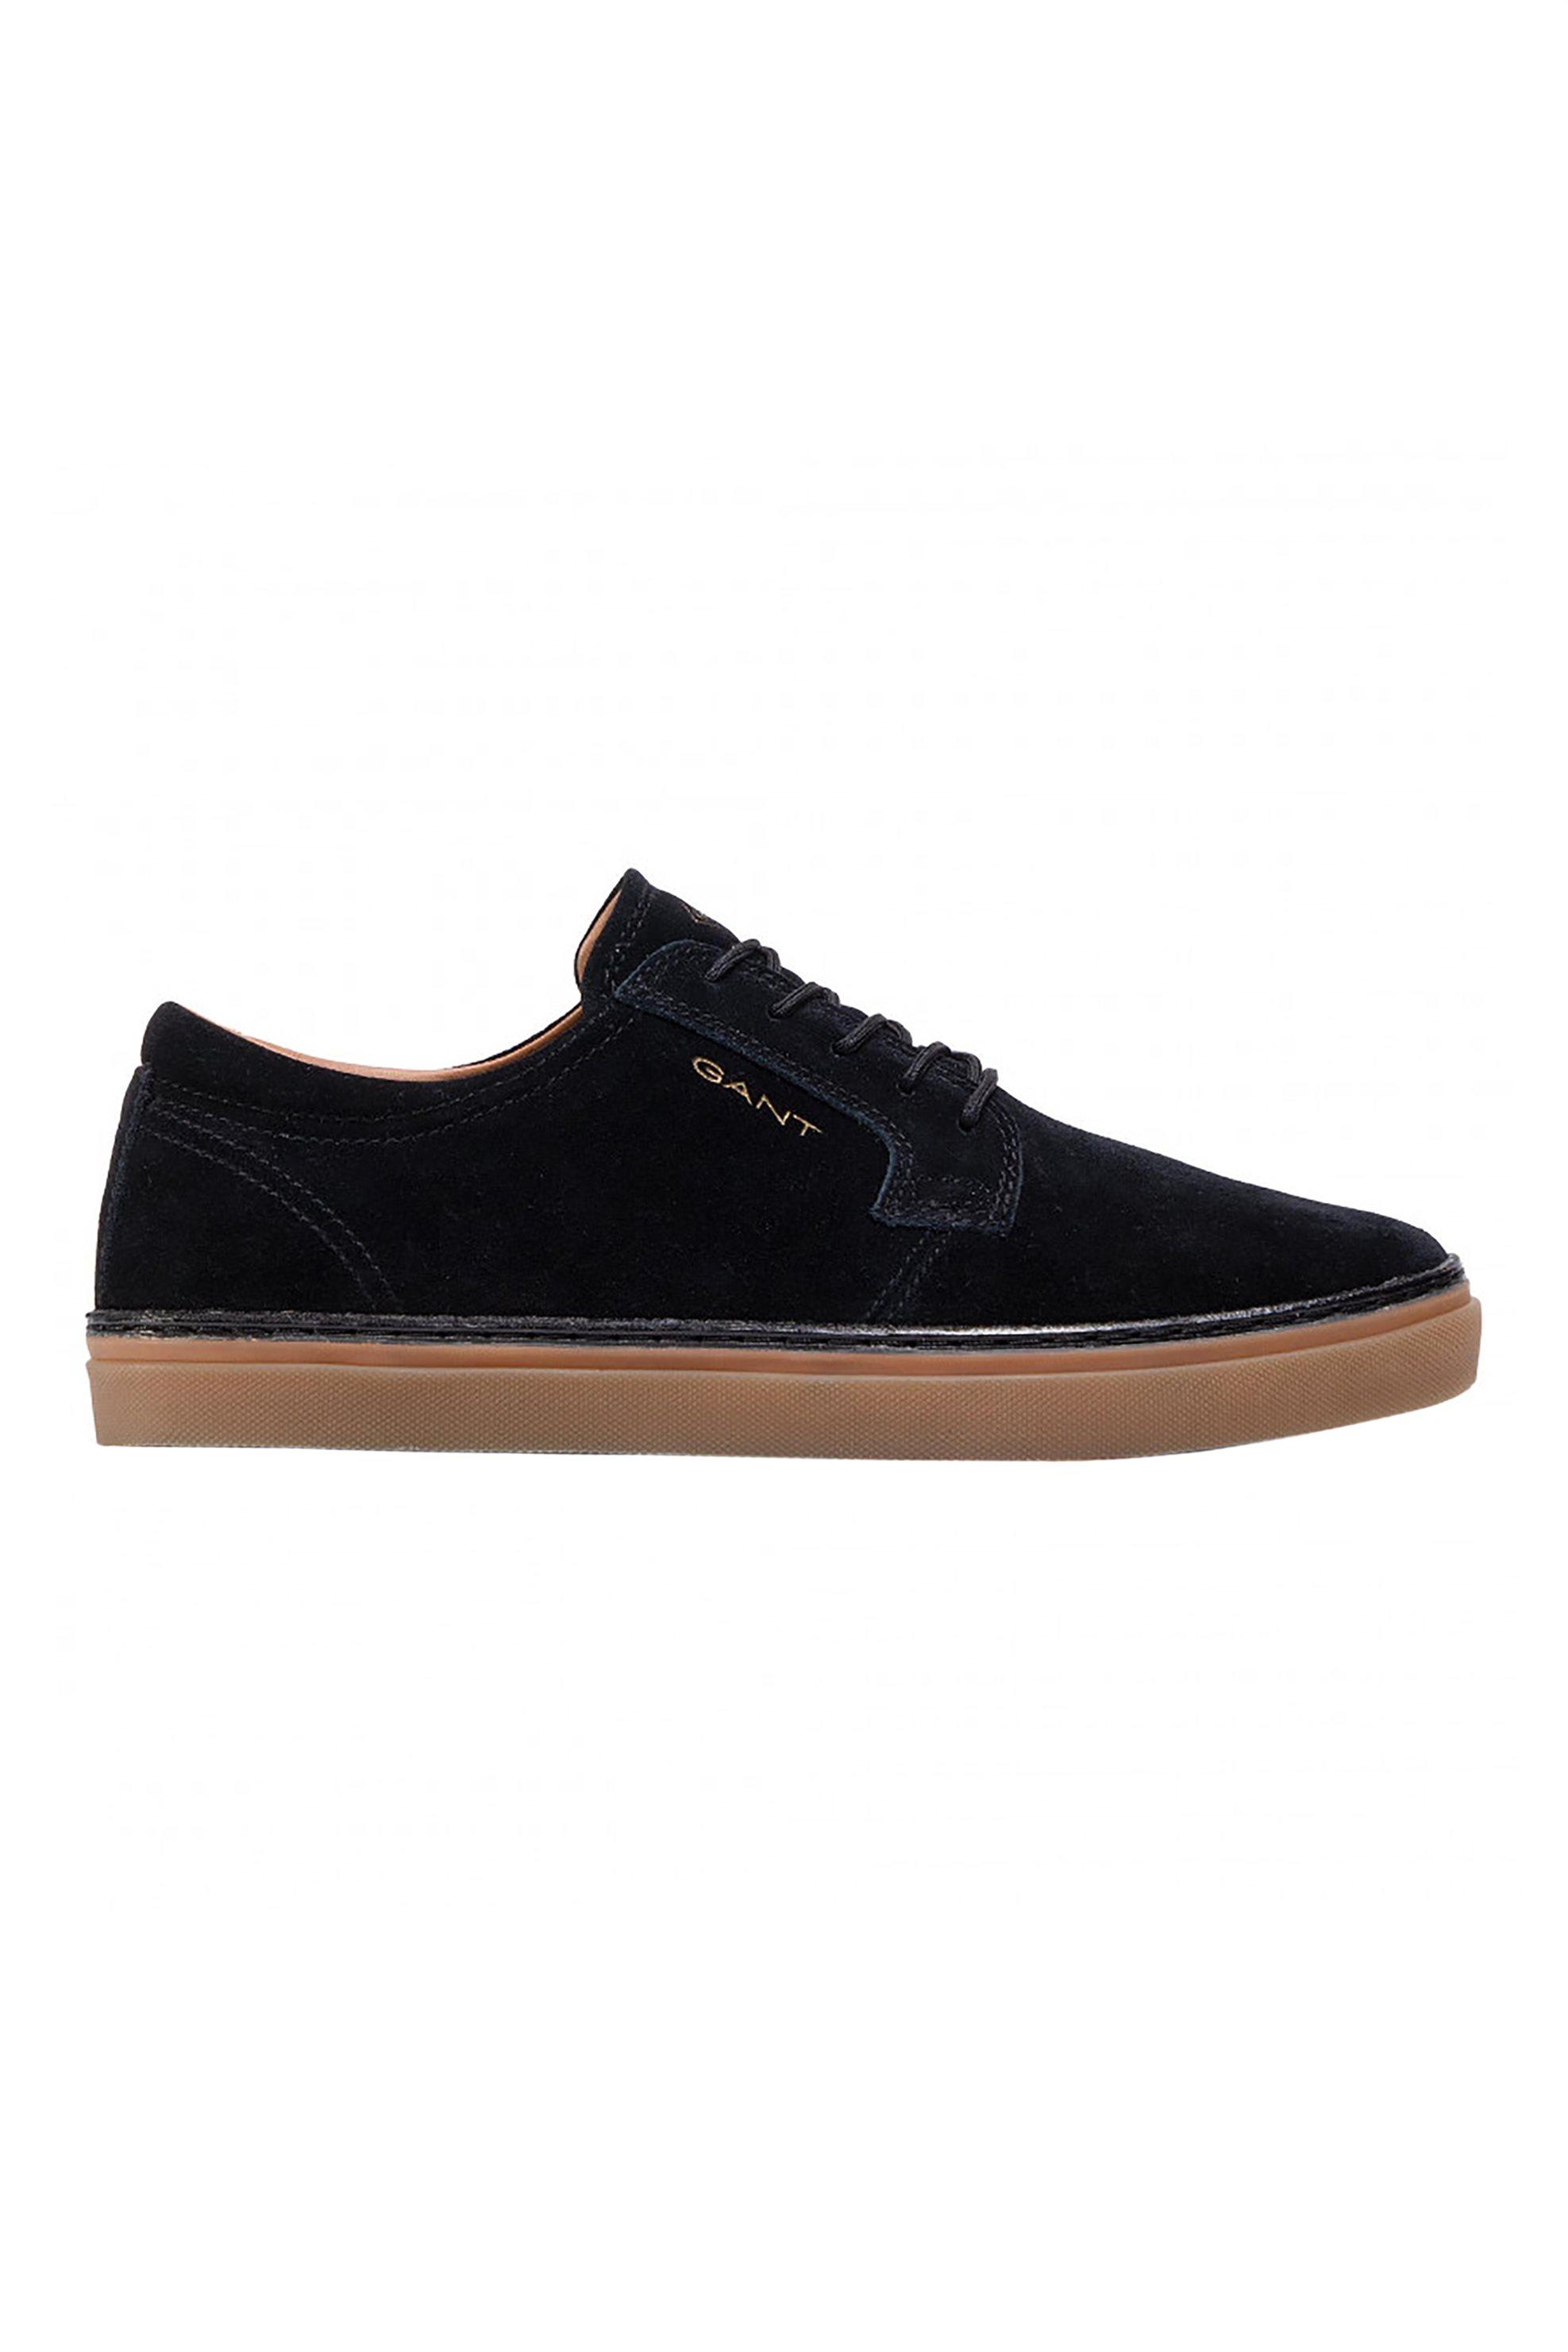 "Gant ανδρικά suede sneakers με κορδόνια ""Prepville"" – 21633875 – Μαύρο"